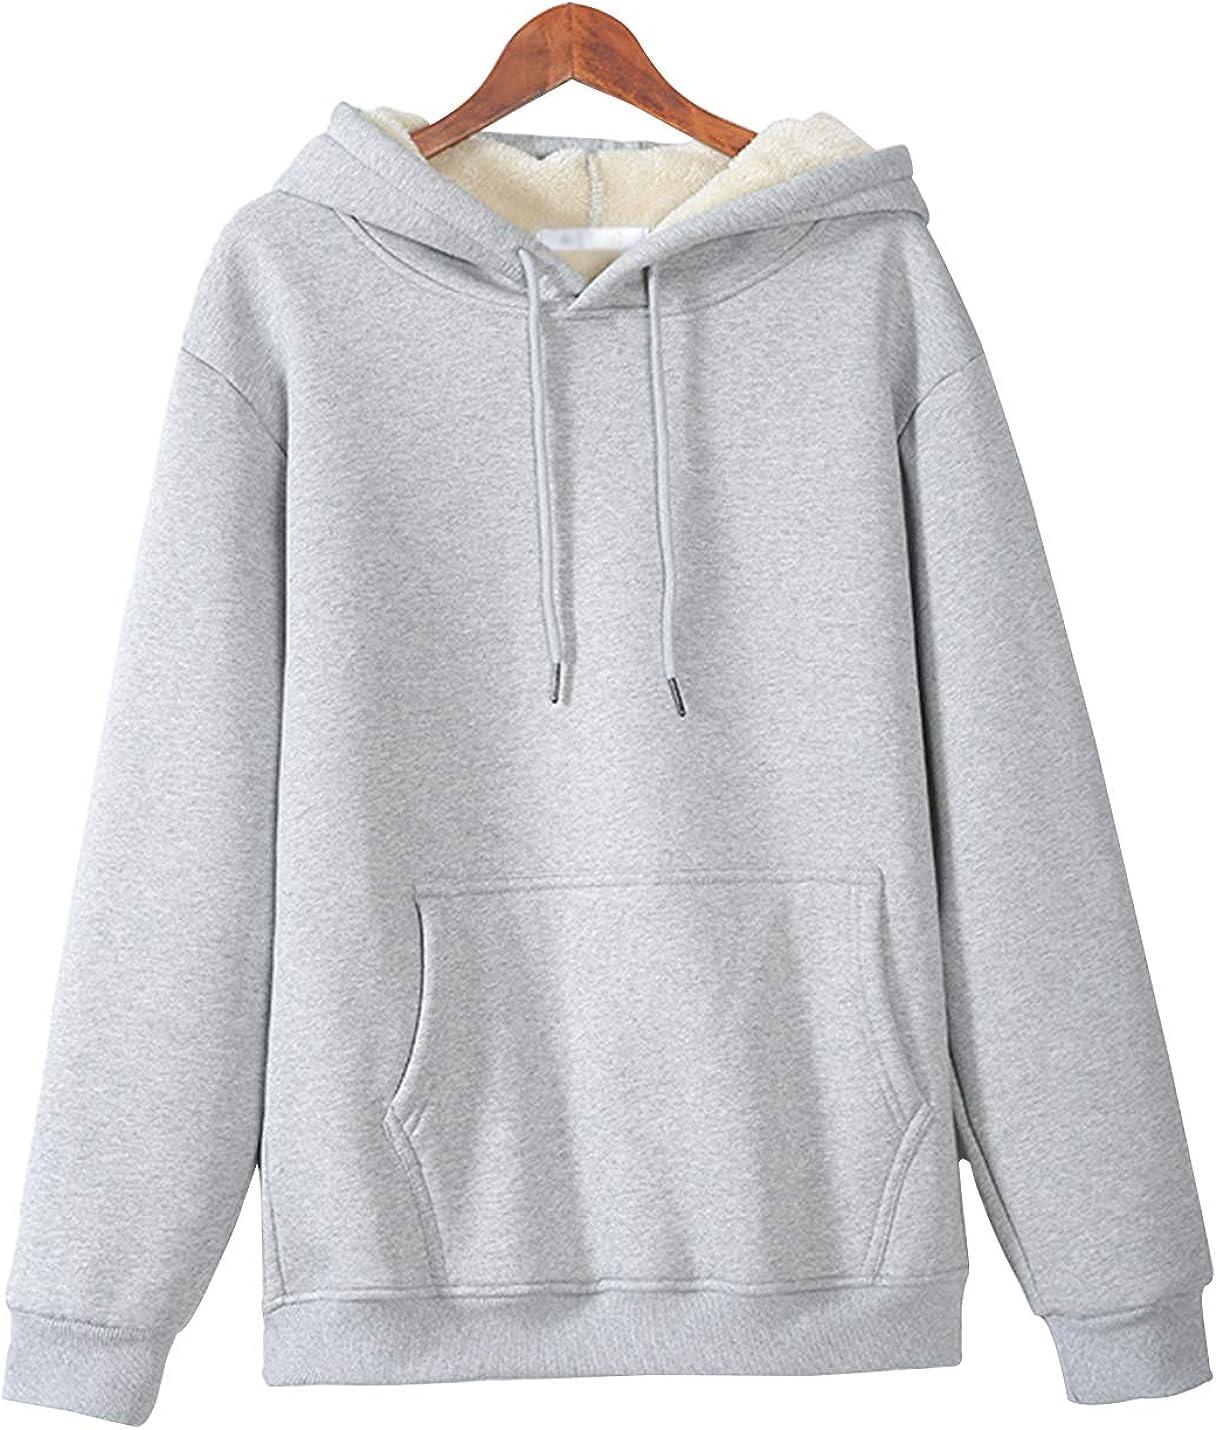 Gihuo Women's Winter Sherpa Lined Pullover Hooded Sweatshirt Hoodie